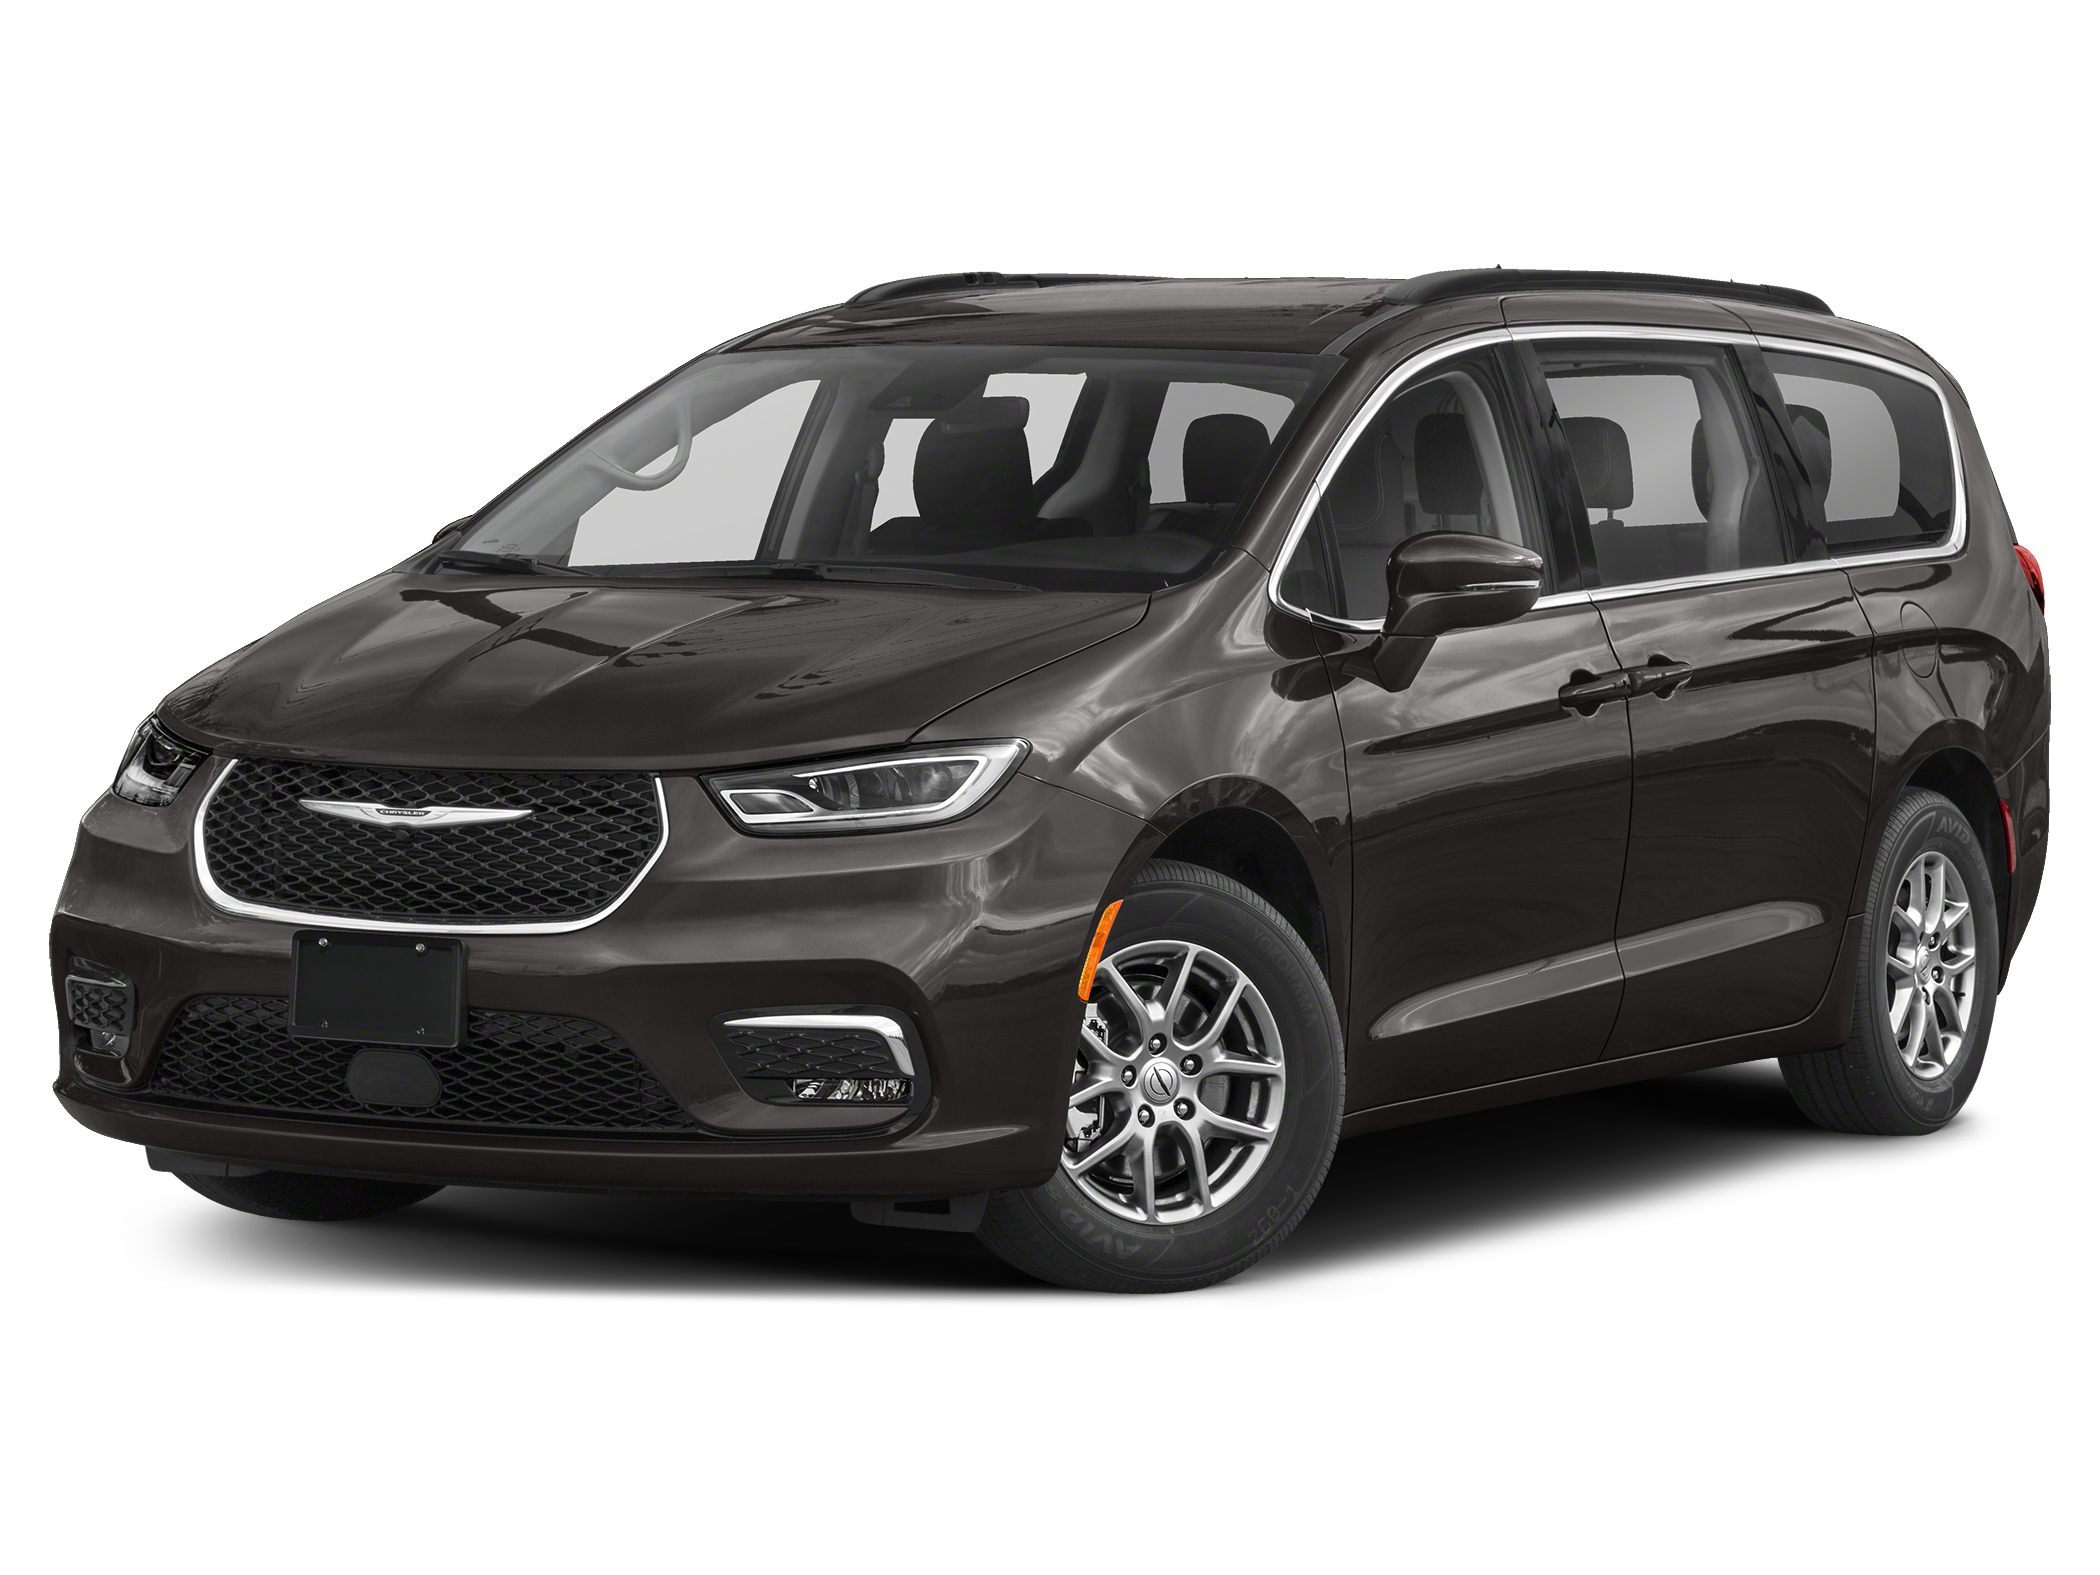 2021 Chrysler Pacifica Minivan